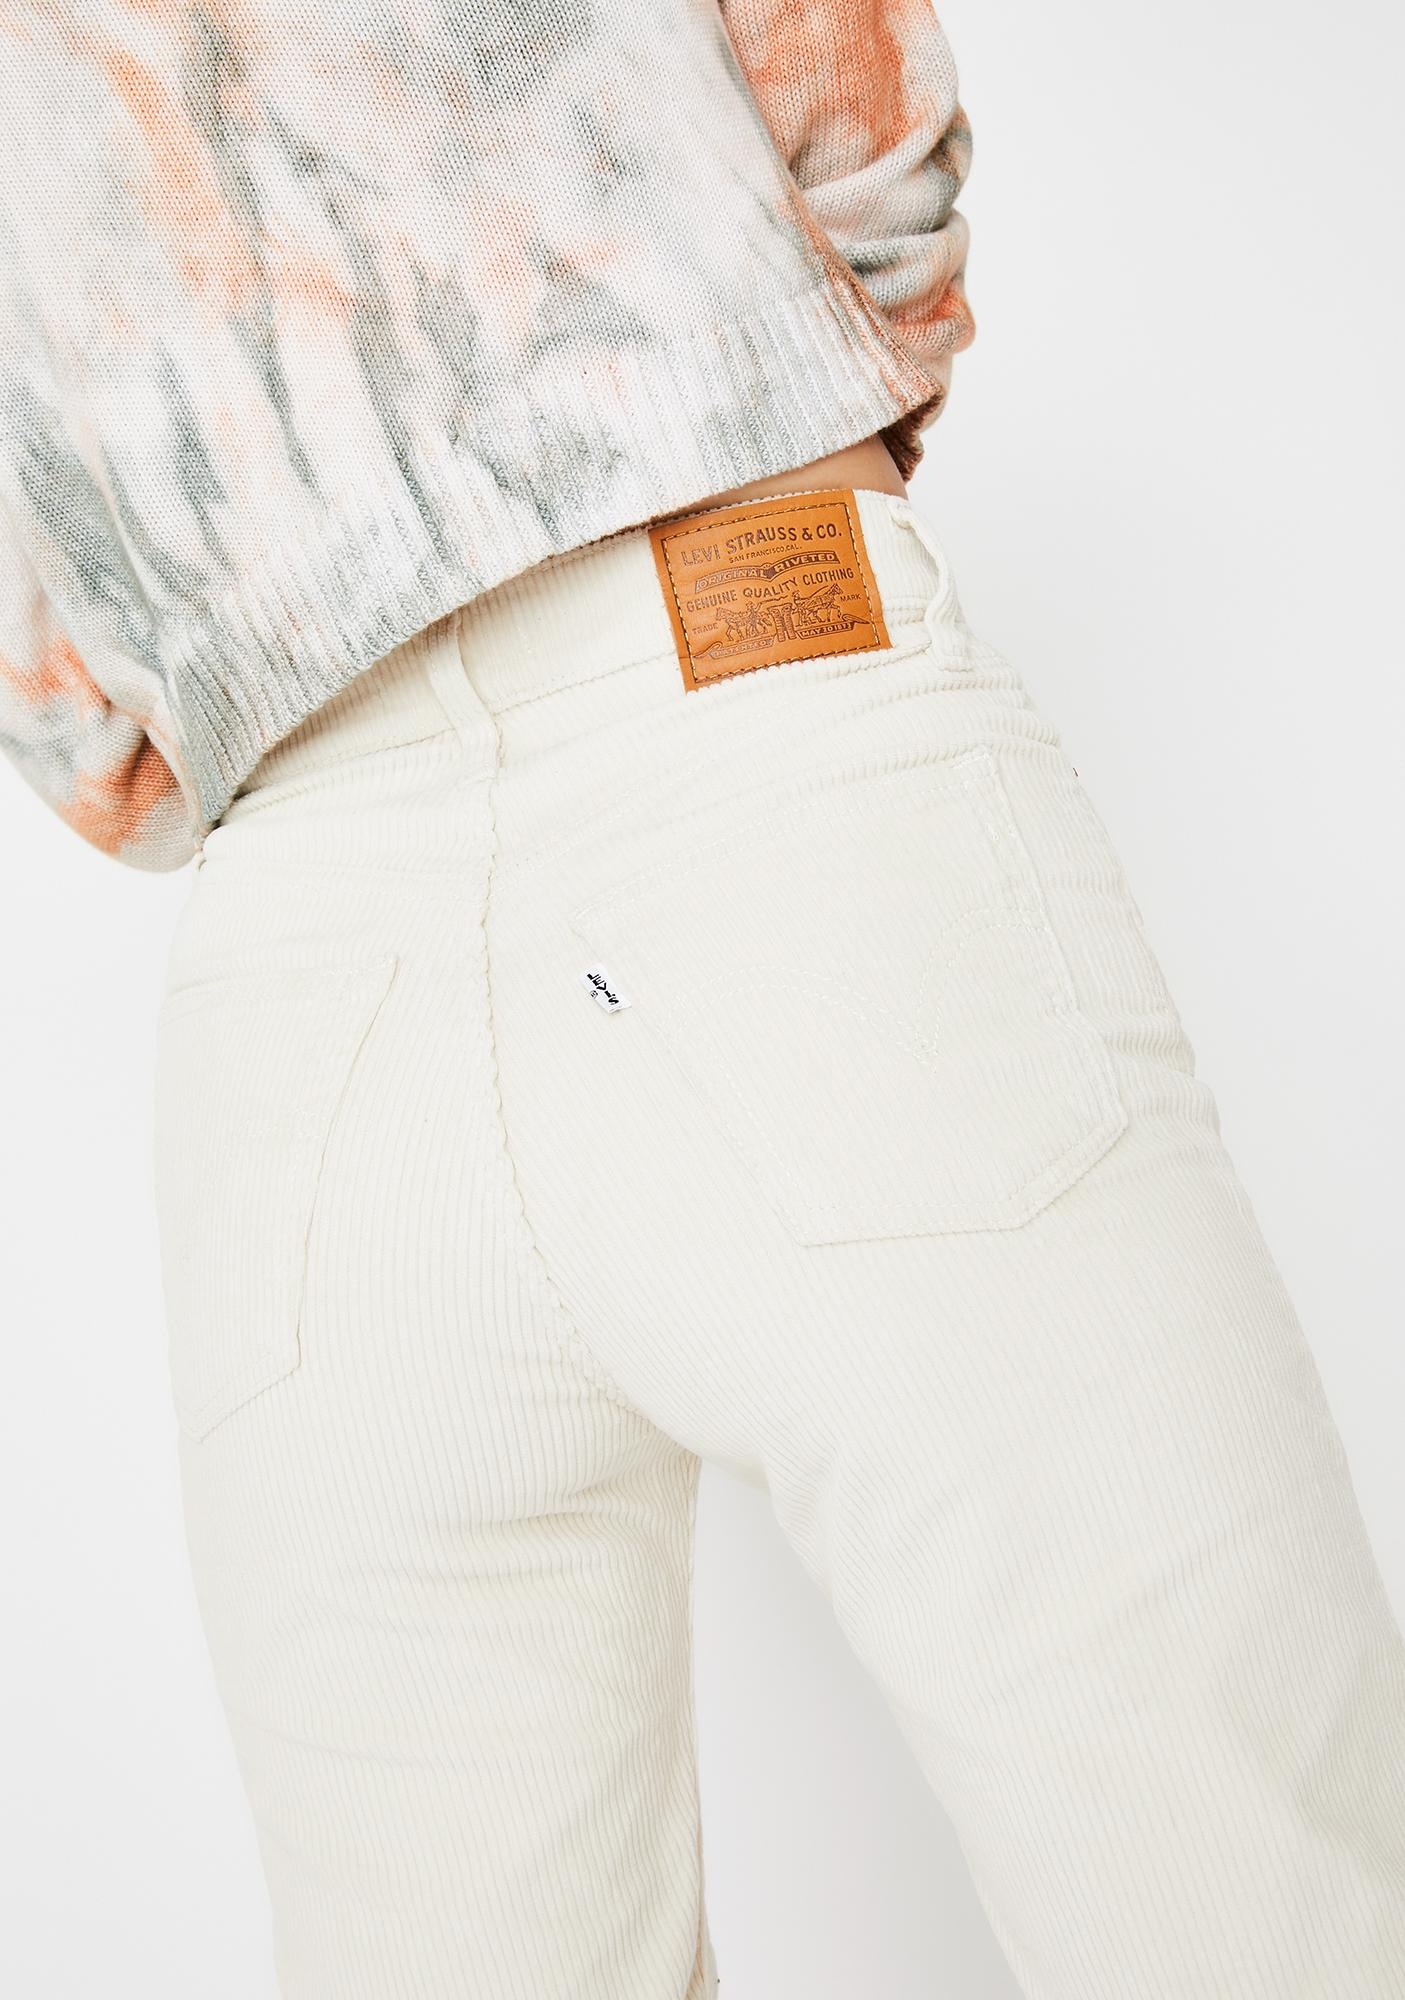 Levis Ecru Corduroy Ribcage Straight Leg Ankle Jeans